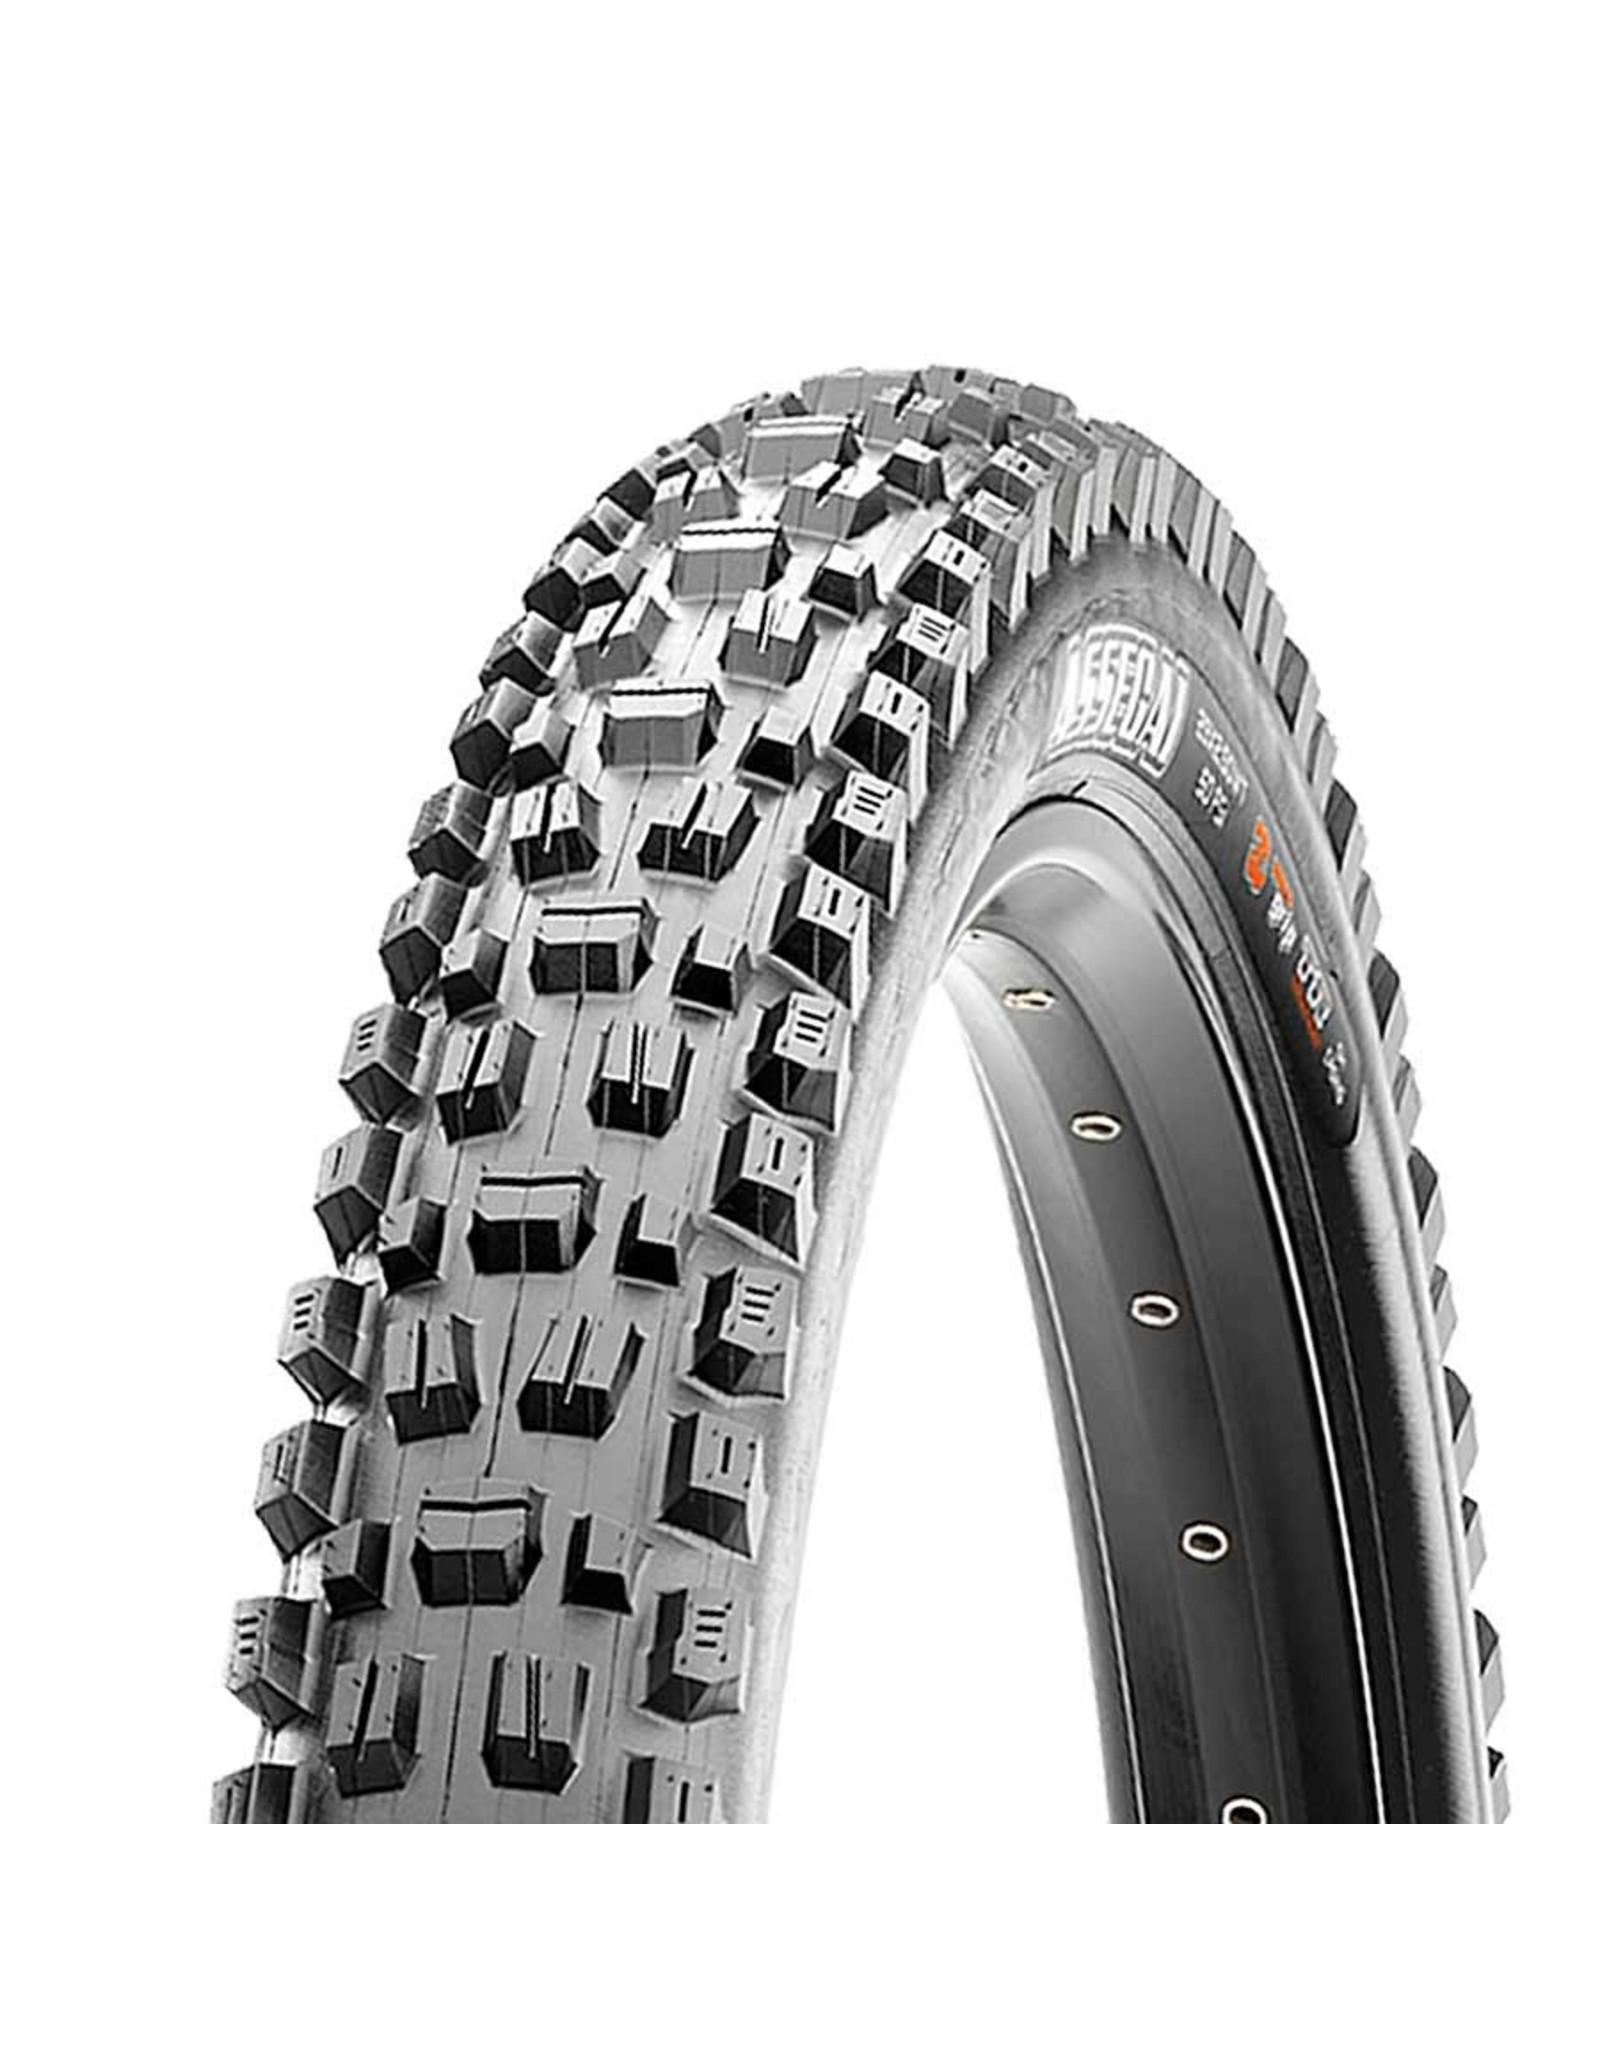 Maxxis, Assegai, Tire, 27.5''x2.50, Folding, Tubeless Ready, 3C Maxx Grip, Double Down, Wide Trail, 120x2TPI, Black